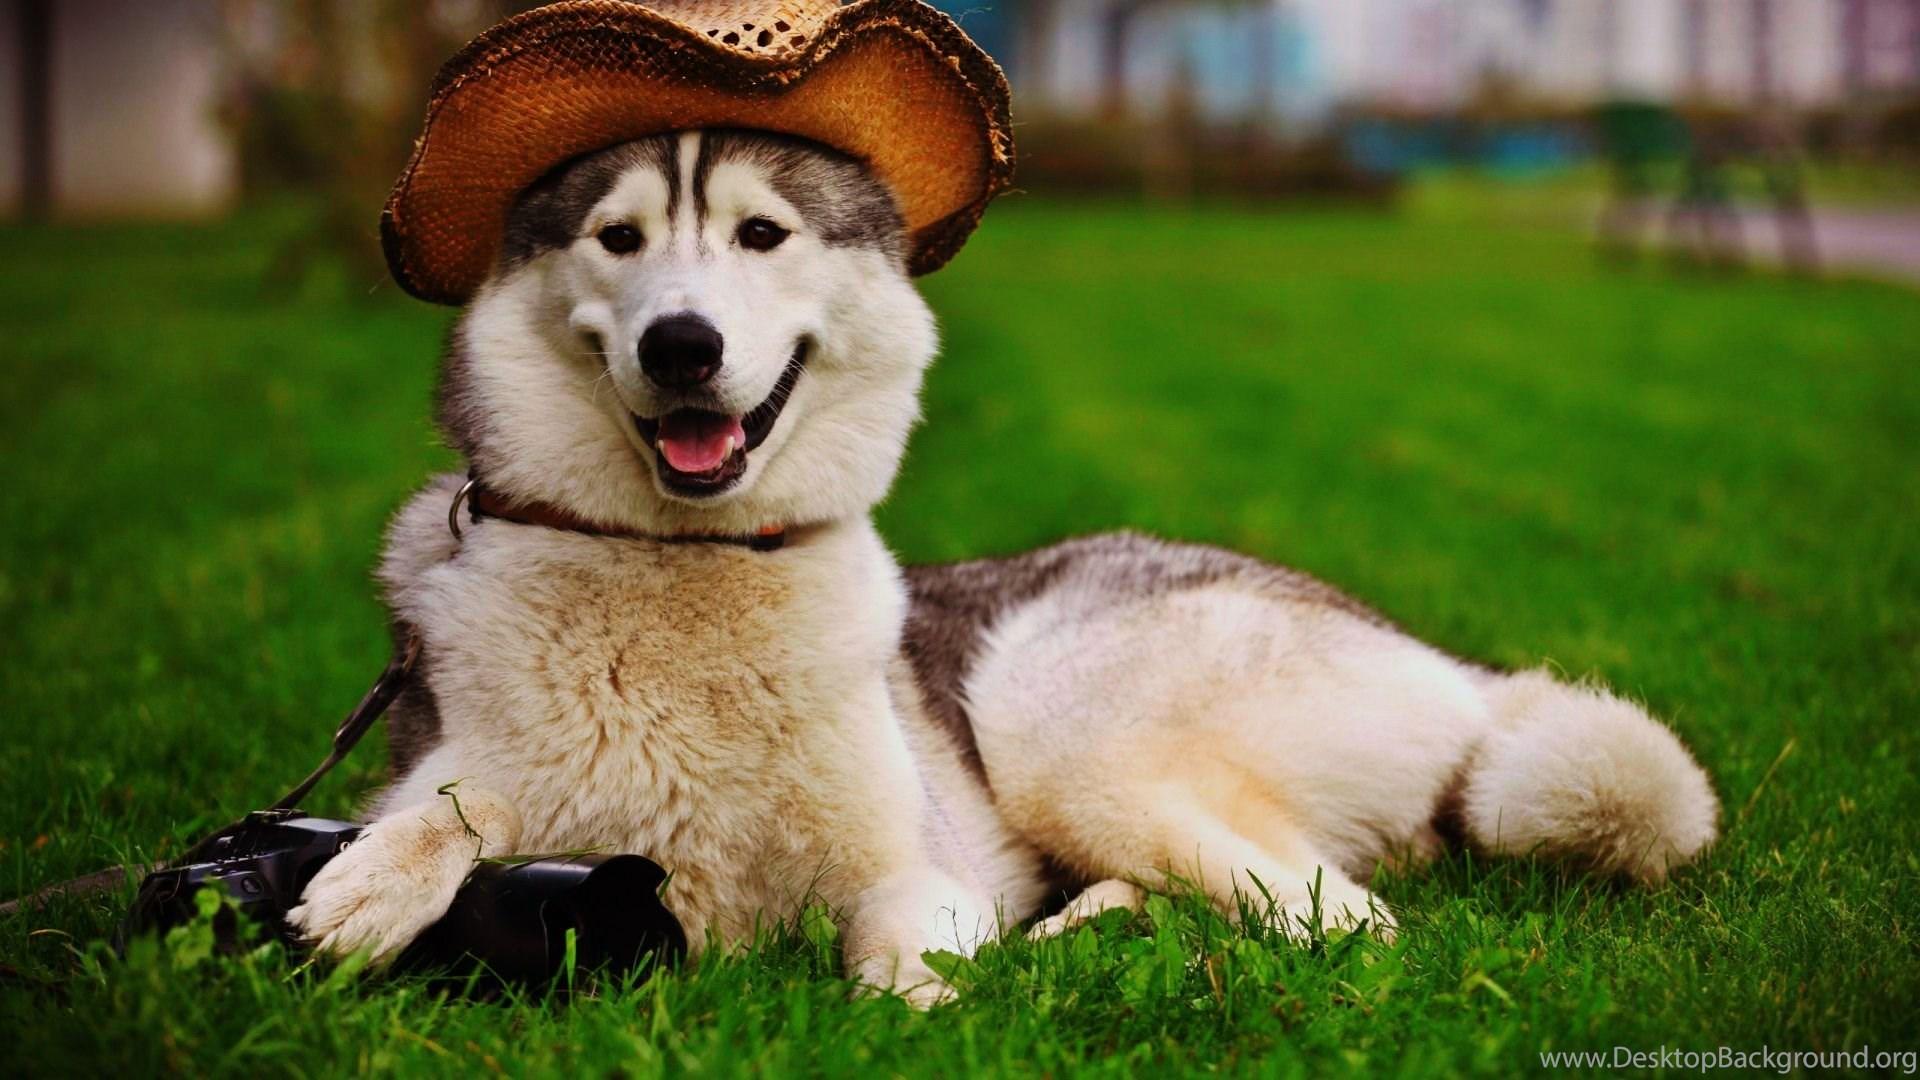 Hd Cute Dog Wallpapers Free For Desktop Best Pet Animals Pictures Hd 1920x1080 Download Hd Wallpaper Wallpapertip